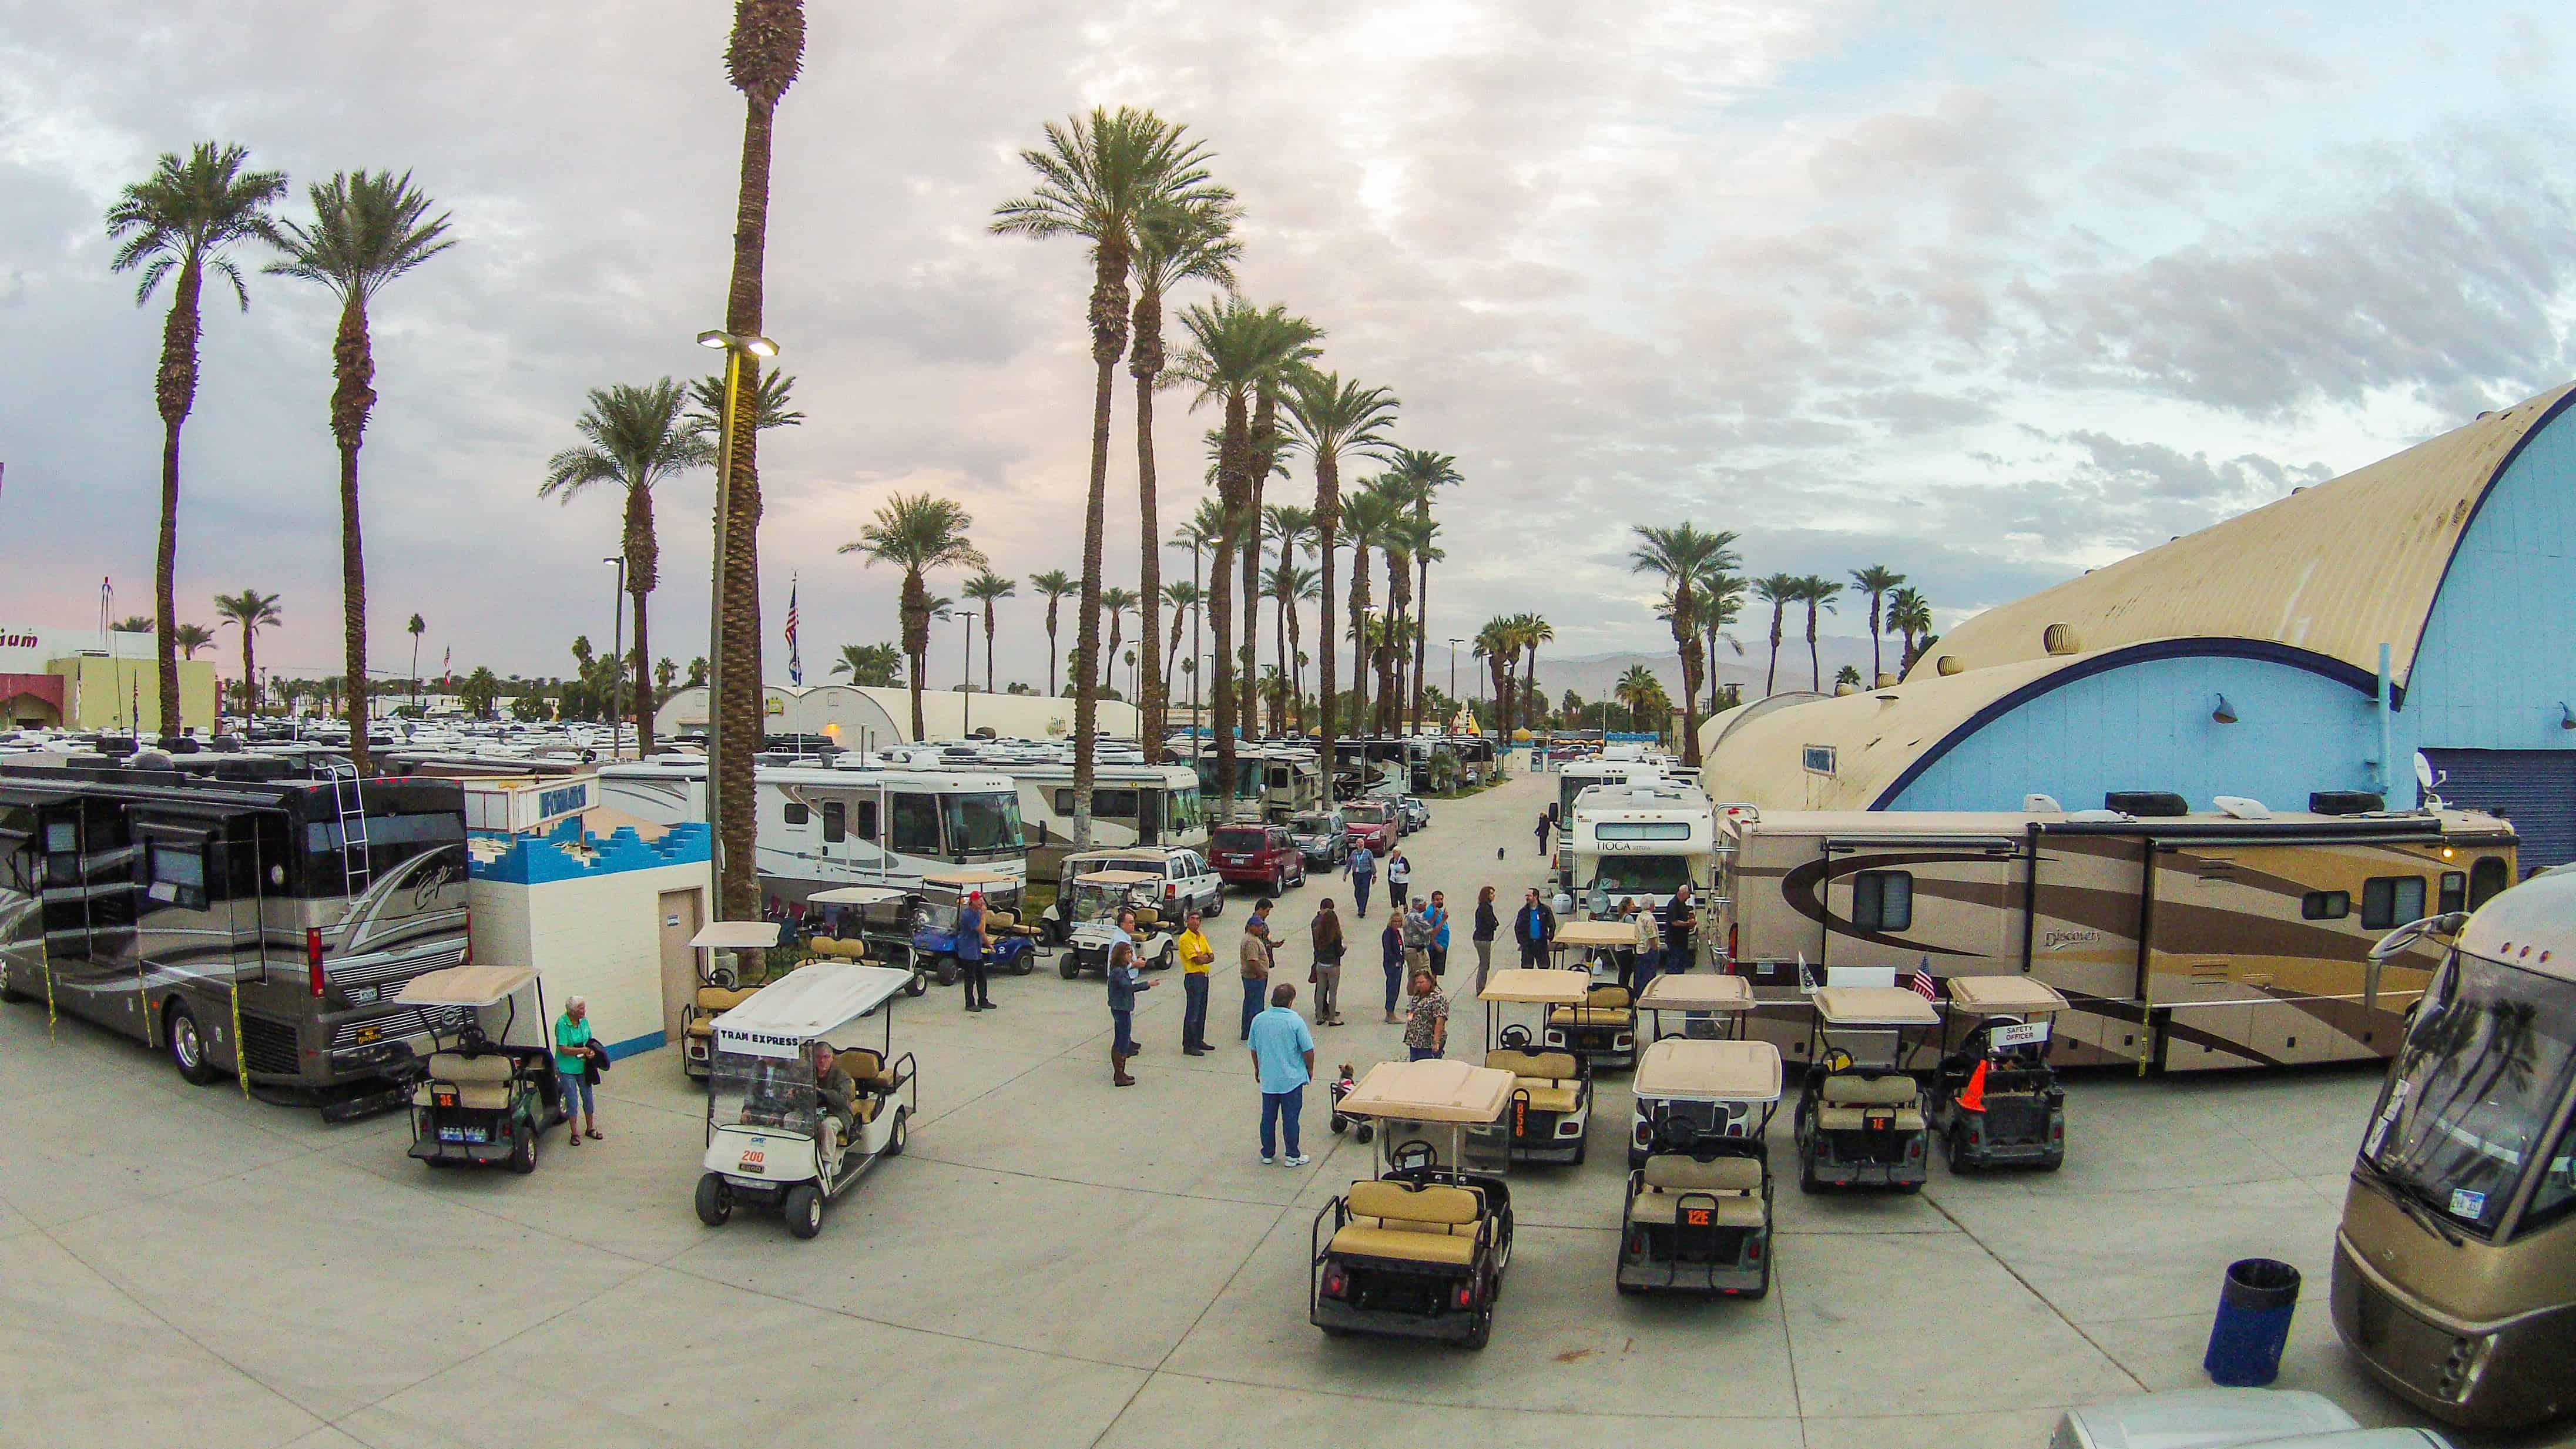 FMCA RV Rally Indio California